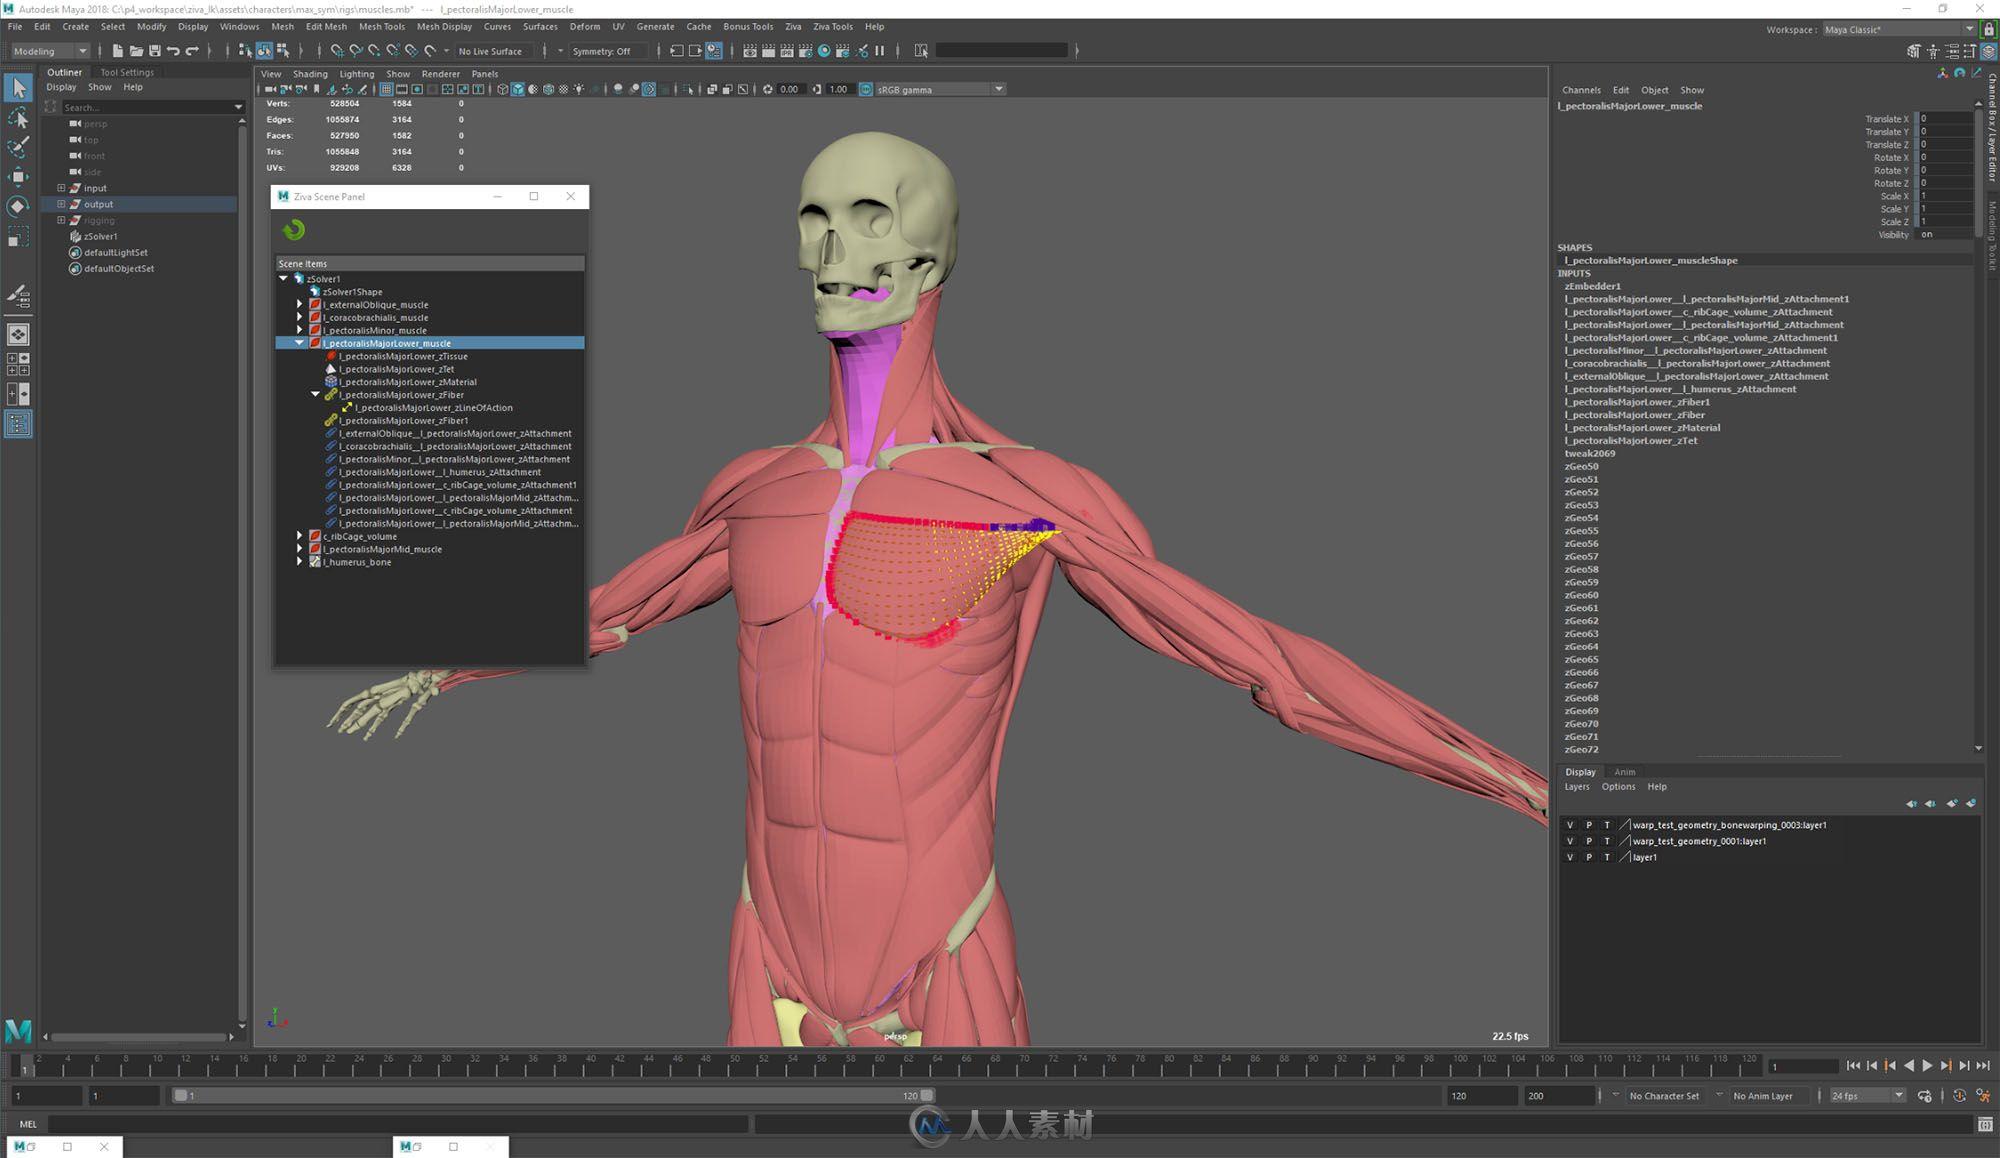 Ziva Dynamics Ziva VFX骨骼肌肉运动模拟Maya插件V1.6版99 / 作者:抱着猫的老鼠 / 帖子ID:16755361,5650261